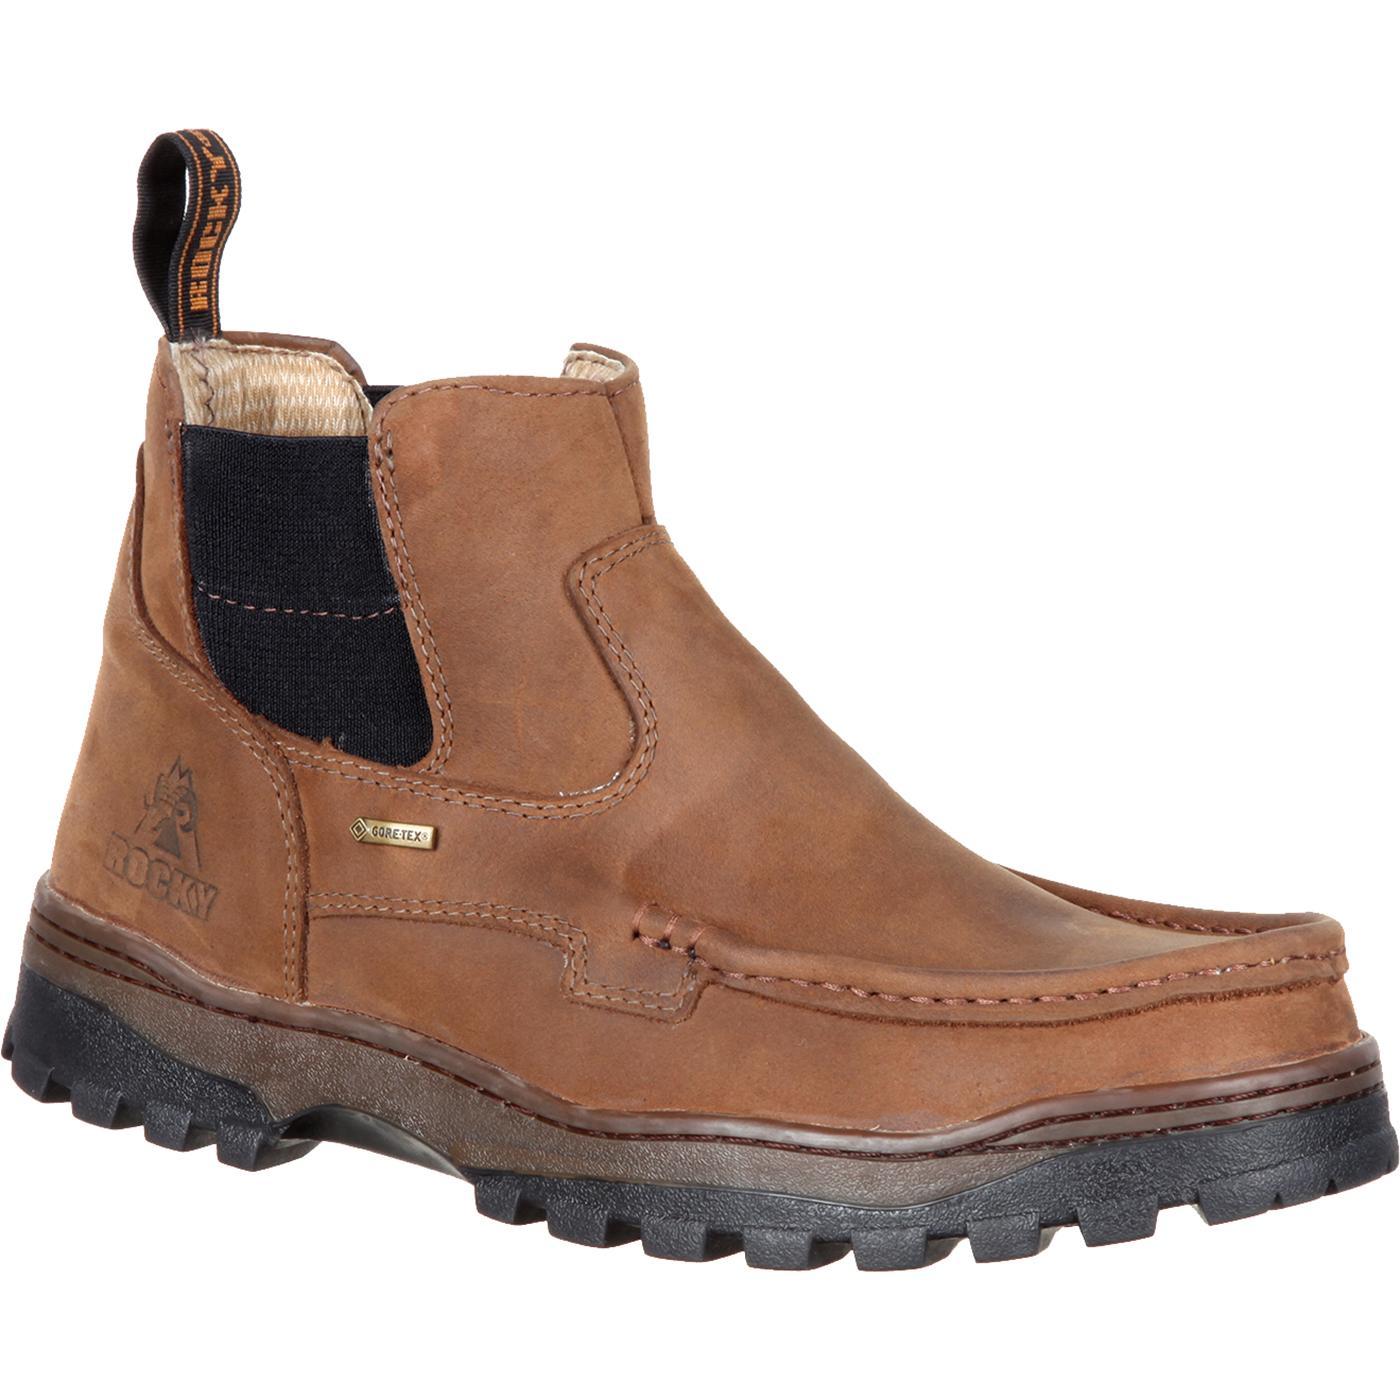 9e4addc9cb5 Rocky Outback GORE-TEX® Waterproof Hiker Boot